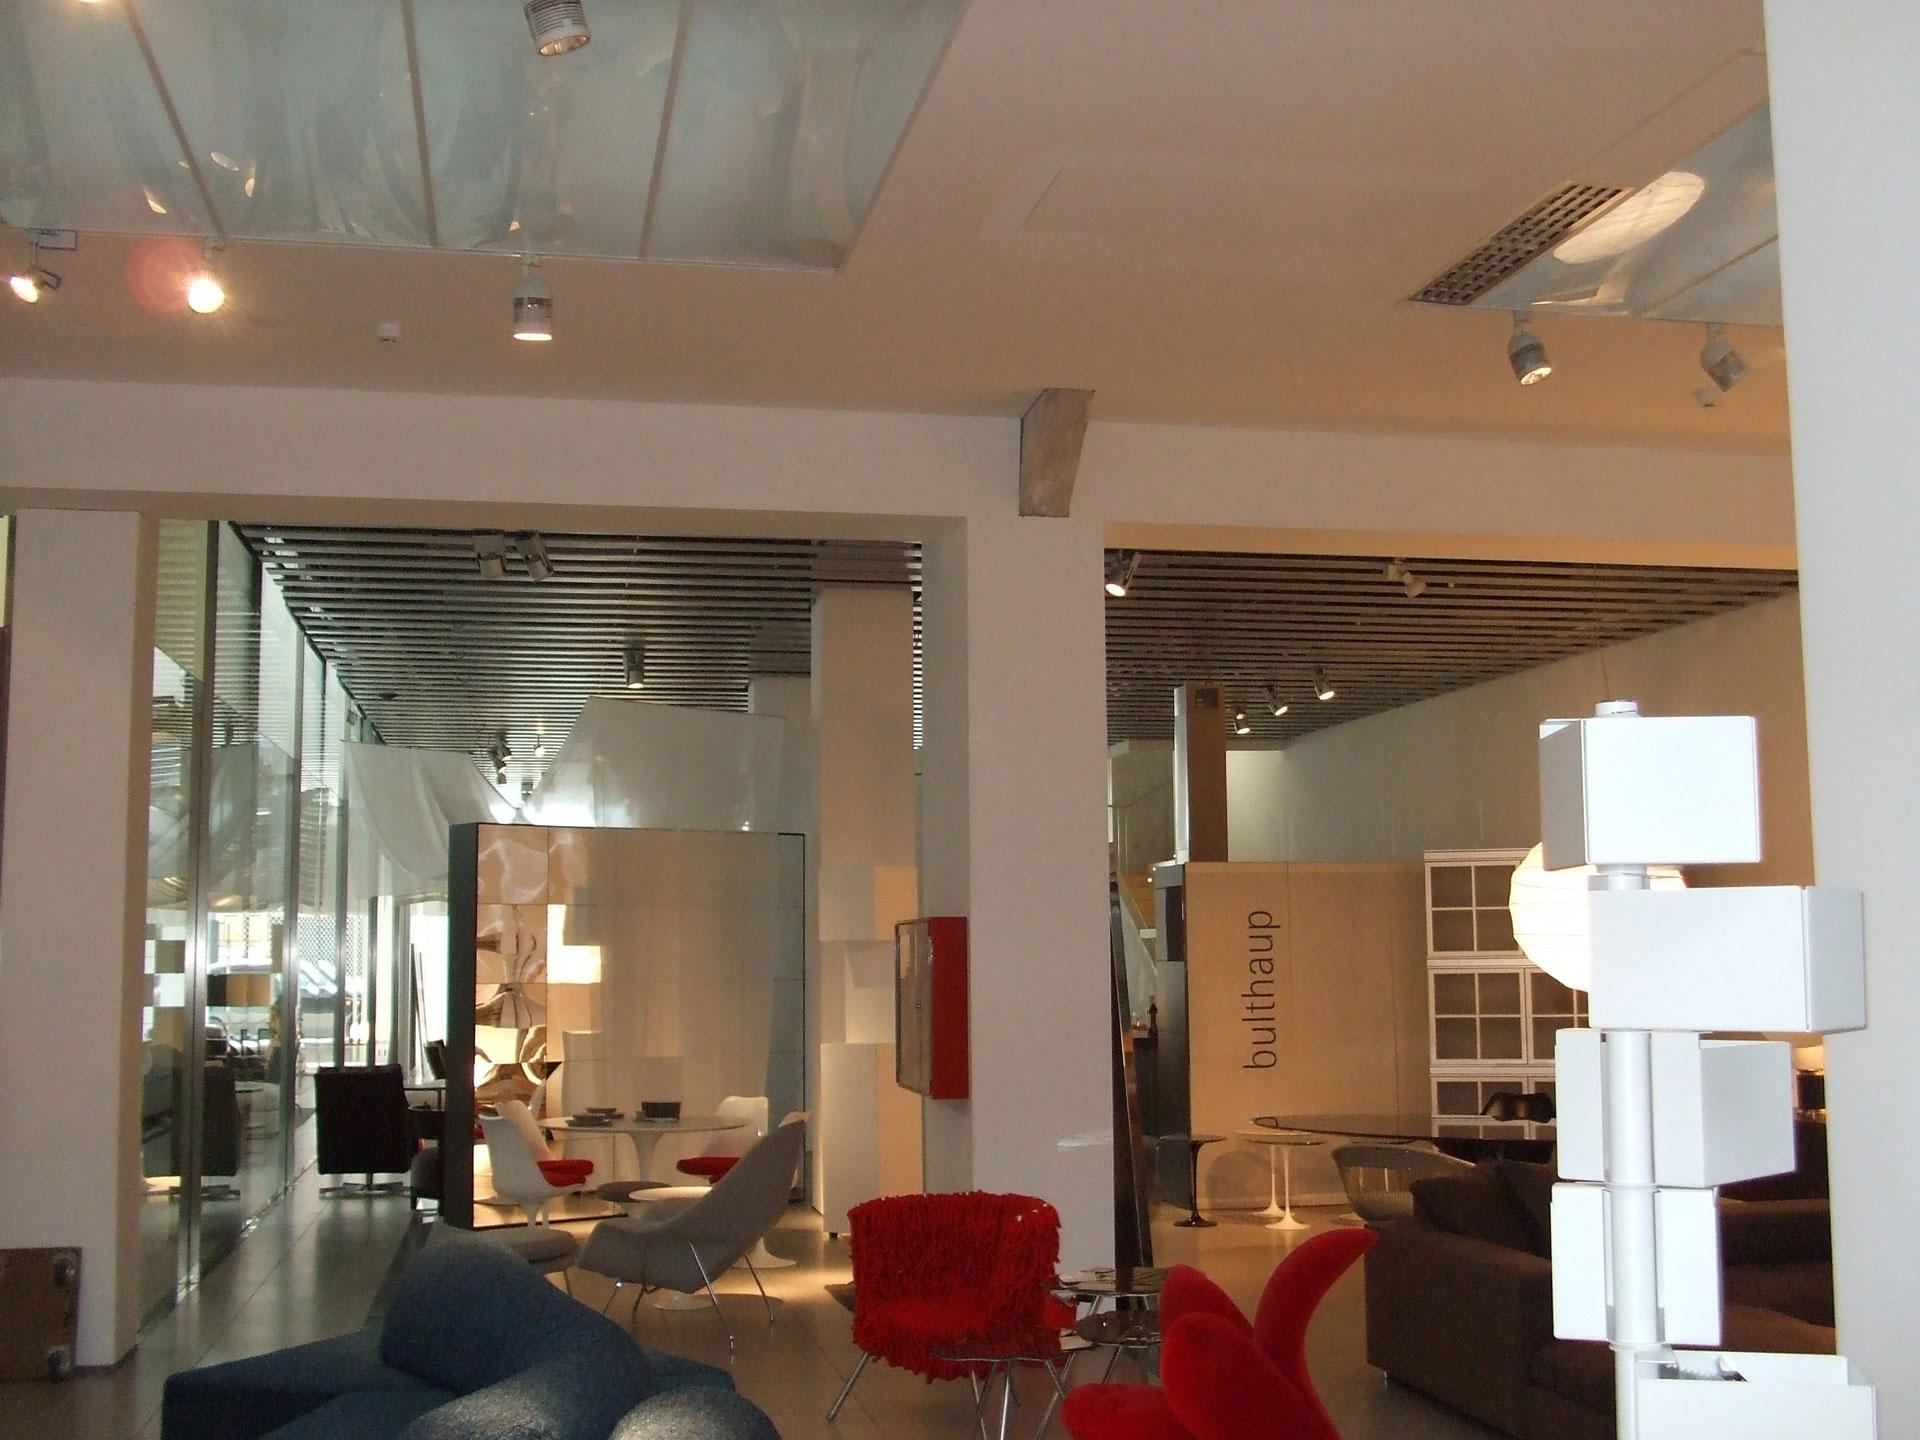 Muebles Sagaseta - Muebles Sagaseta Pamplona Schako Pure Competence In Air [mjhdah]https://schako.com/wp-content/uploads/80_1_exterior_sagaseta.jpg